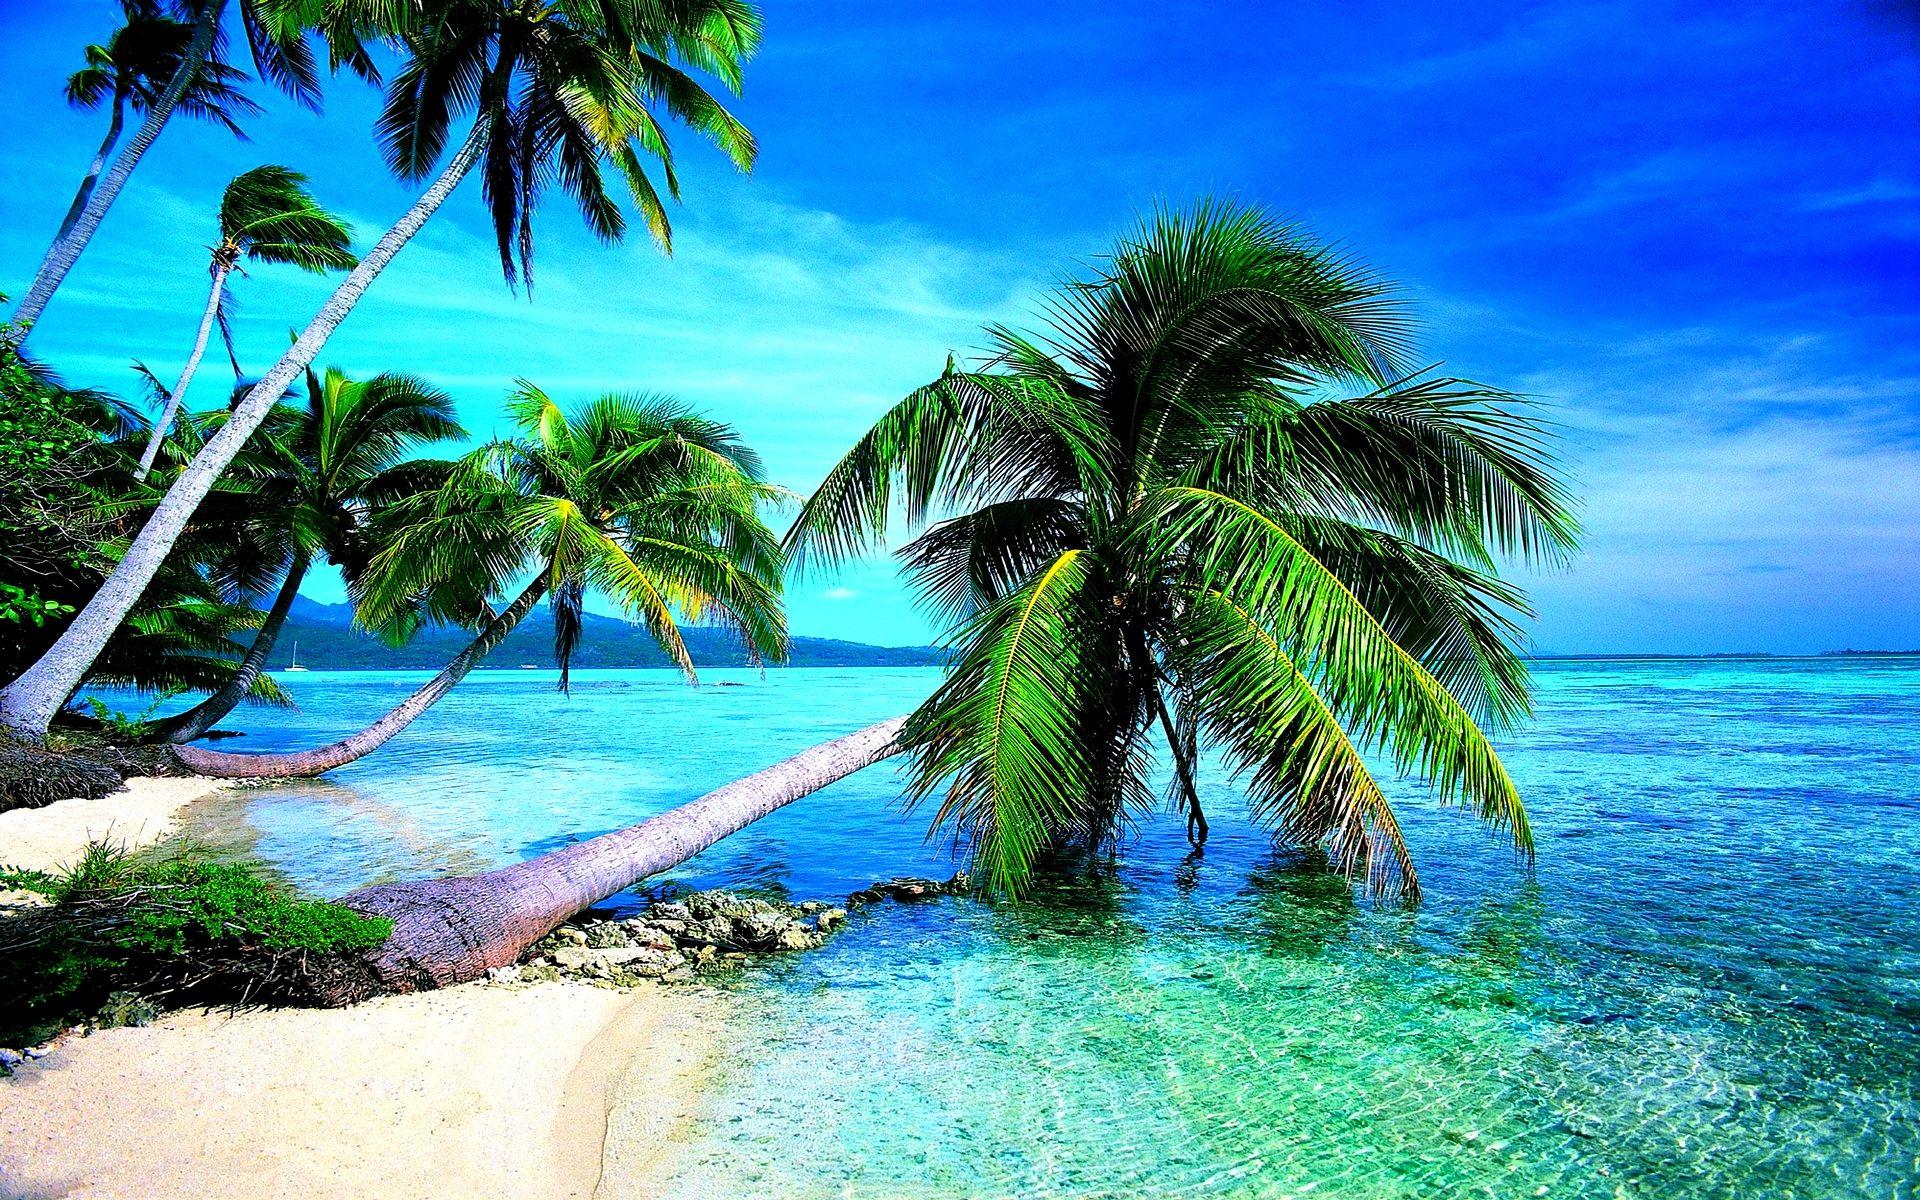 tropical beach - Google Search | Christian's Room ...